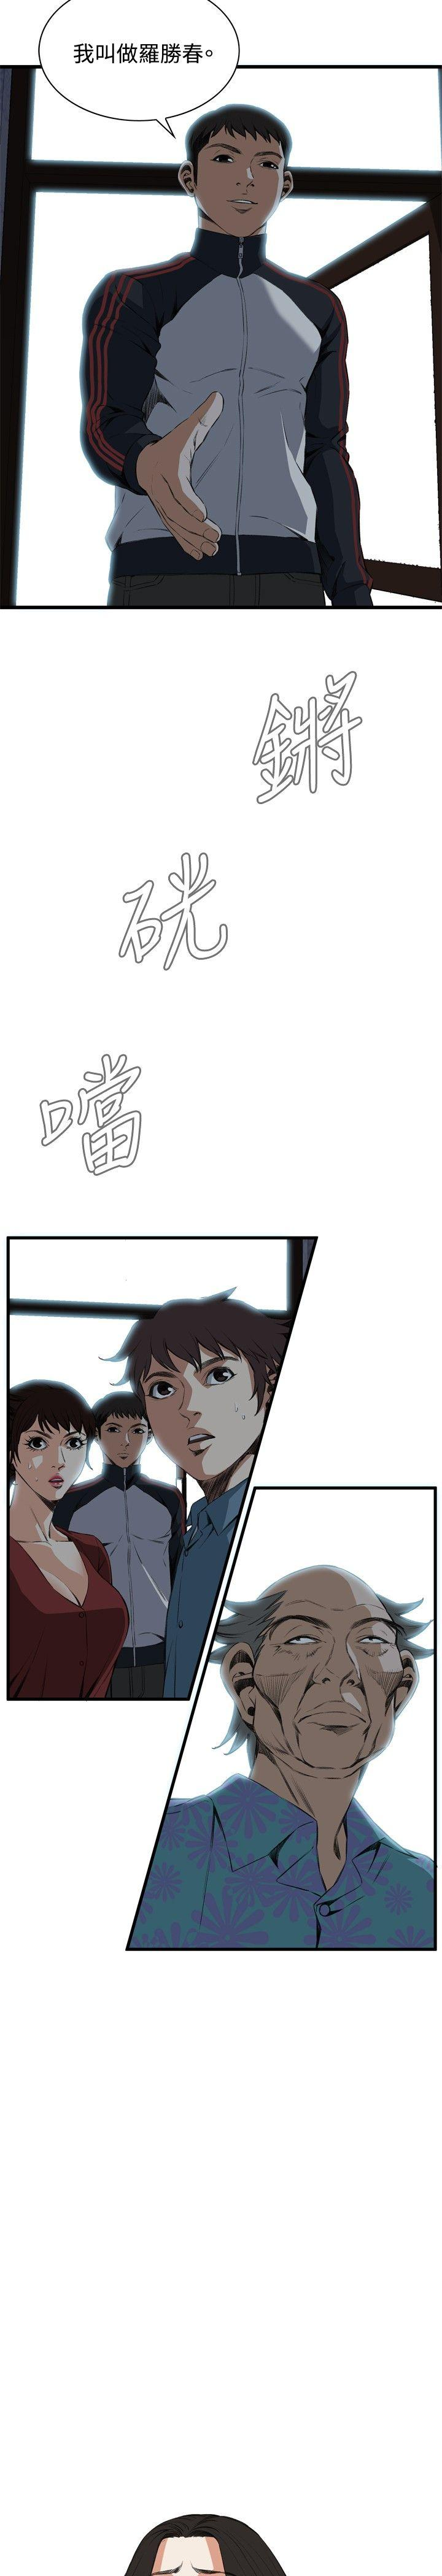 Take a Peek 偷窥 Ch.39~60 [Chinese]中文 534